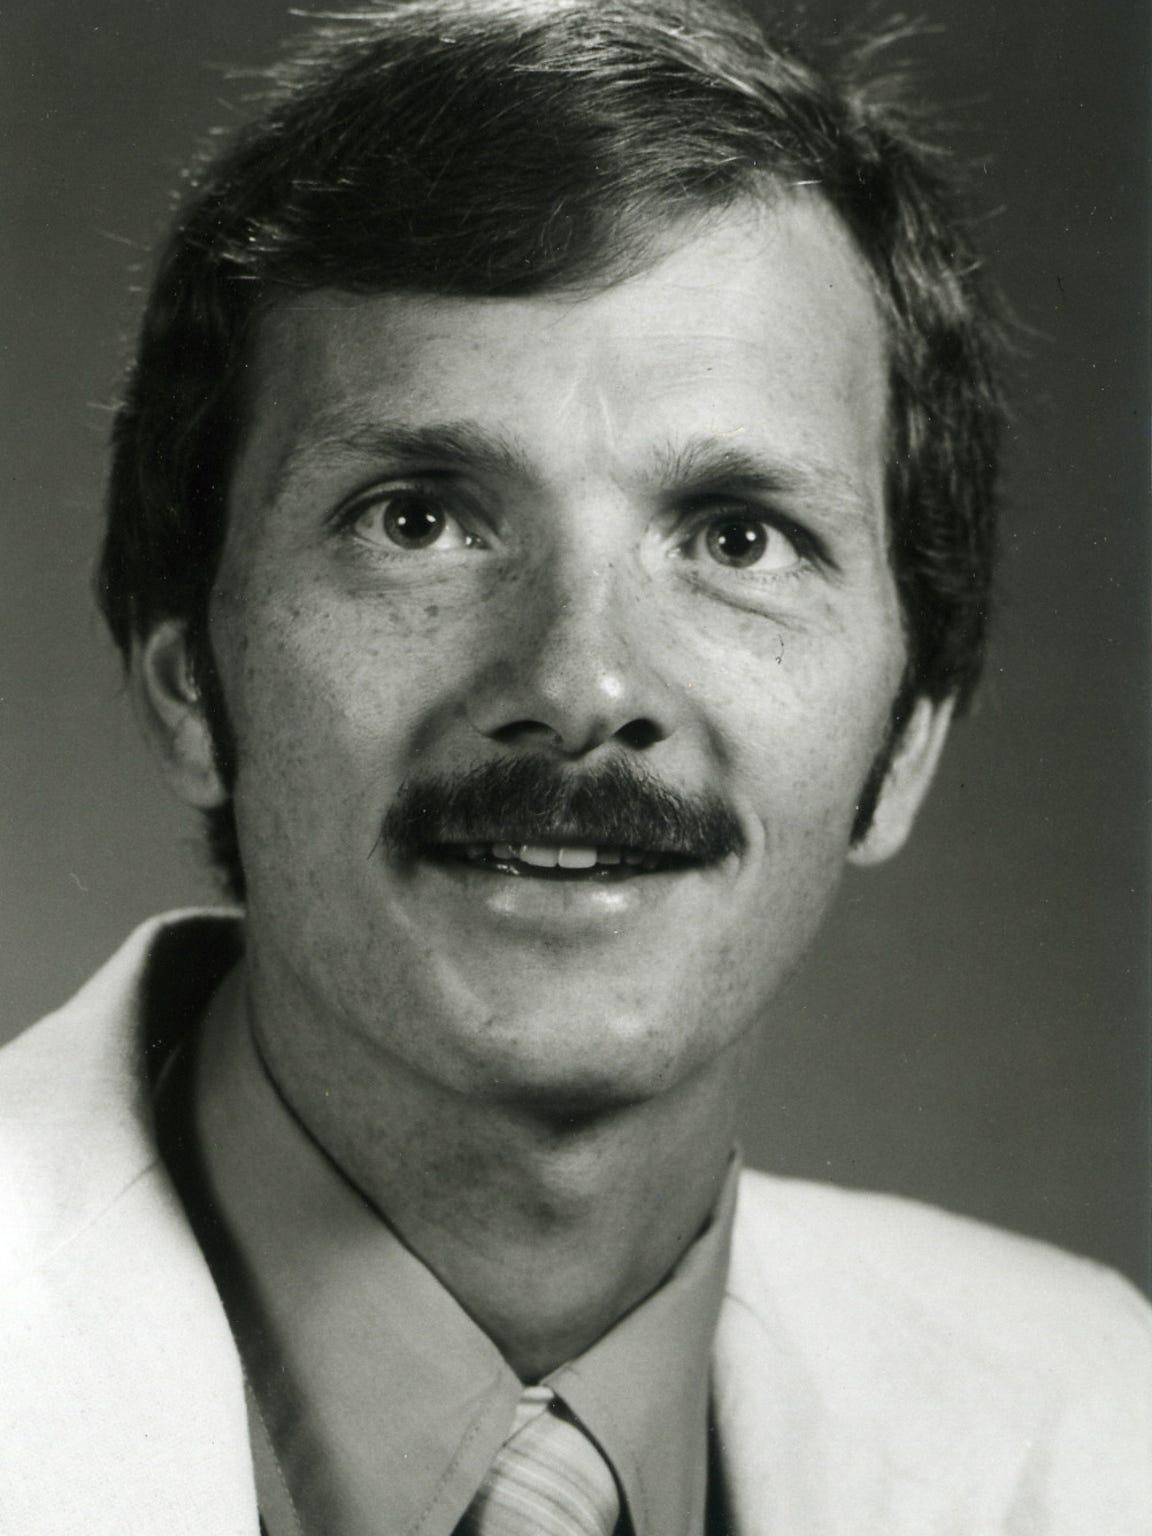 Ron Renko, Iowa State women's cross country coach in 1985.